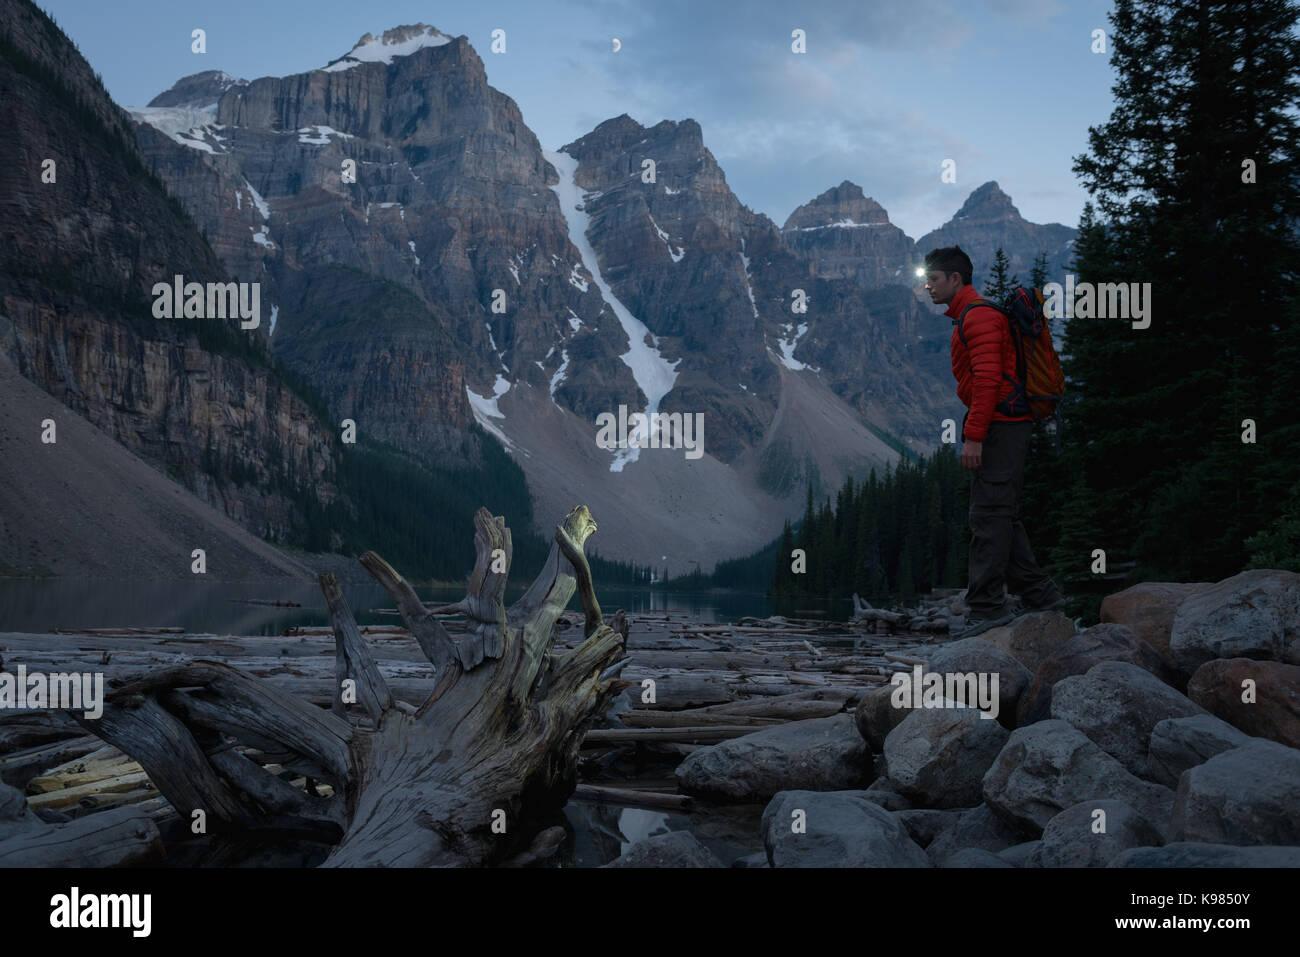 Hiker with headlamp hiking at night - Stock Image